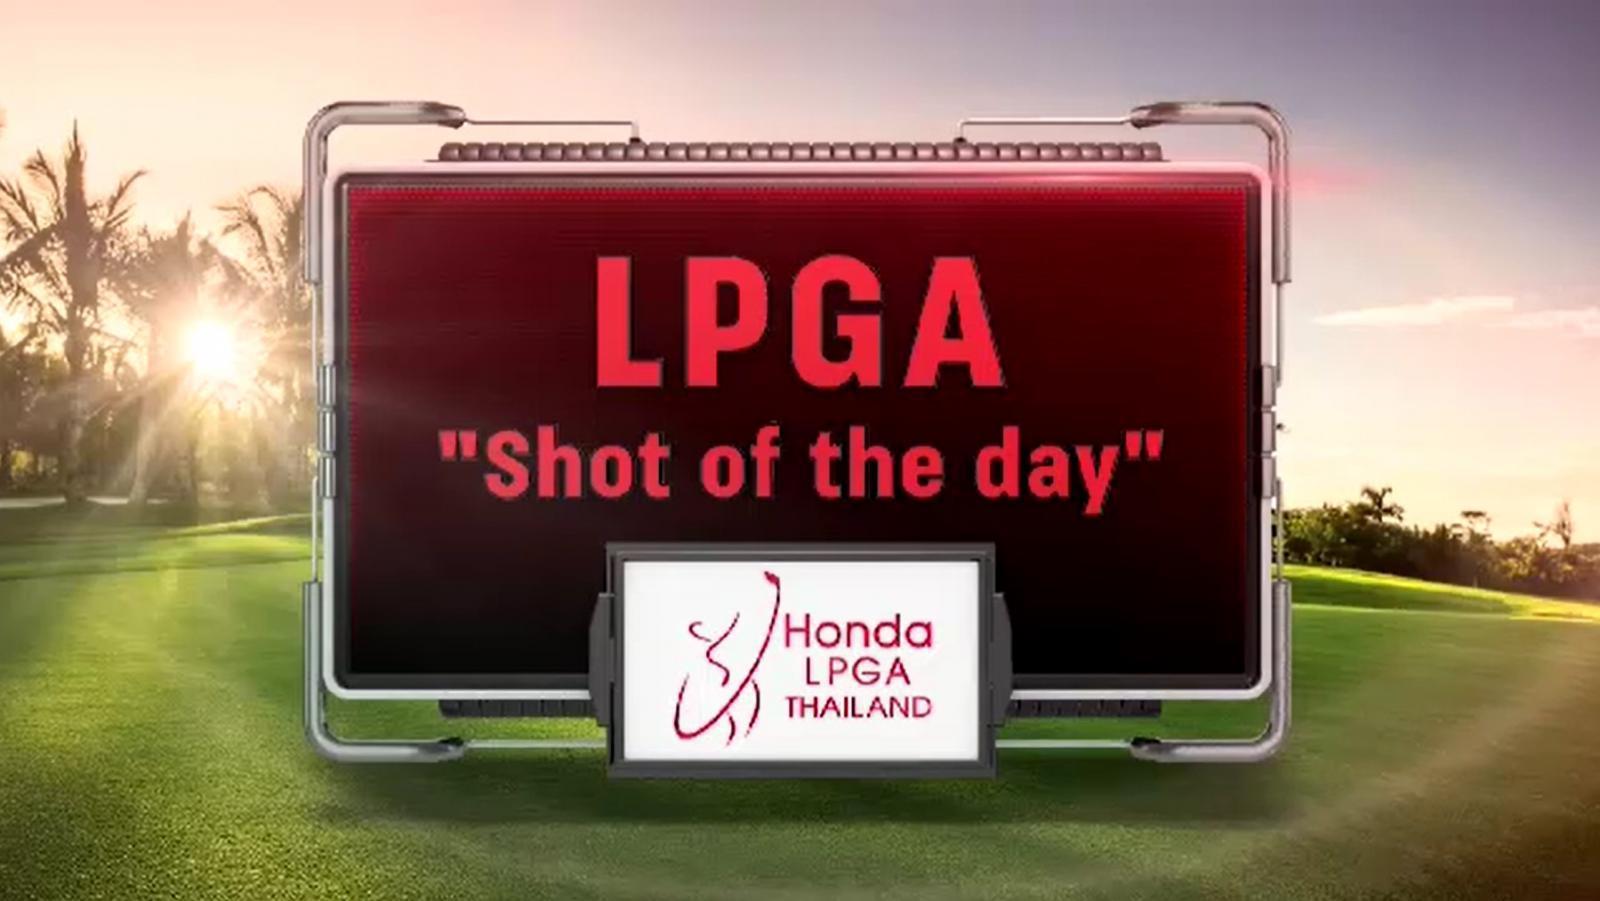 LPGA shot of the day ประจำวันที่ 8 พ.ค. 64